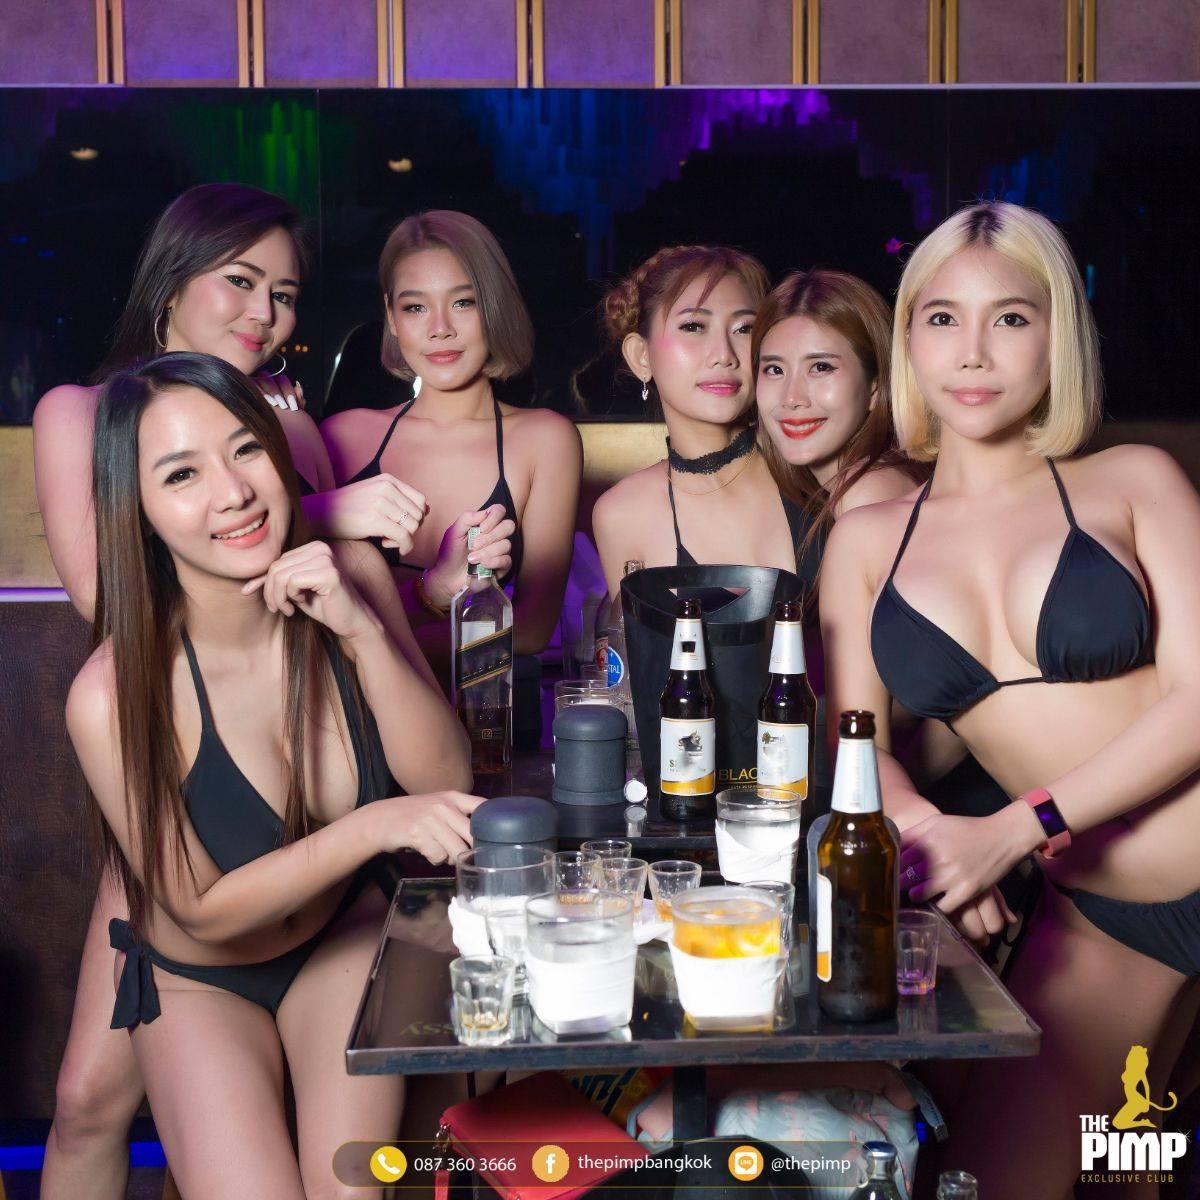 Thai models at a VIP table in the PIMP club